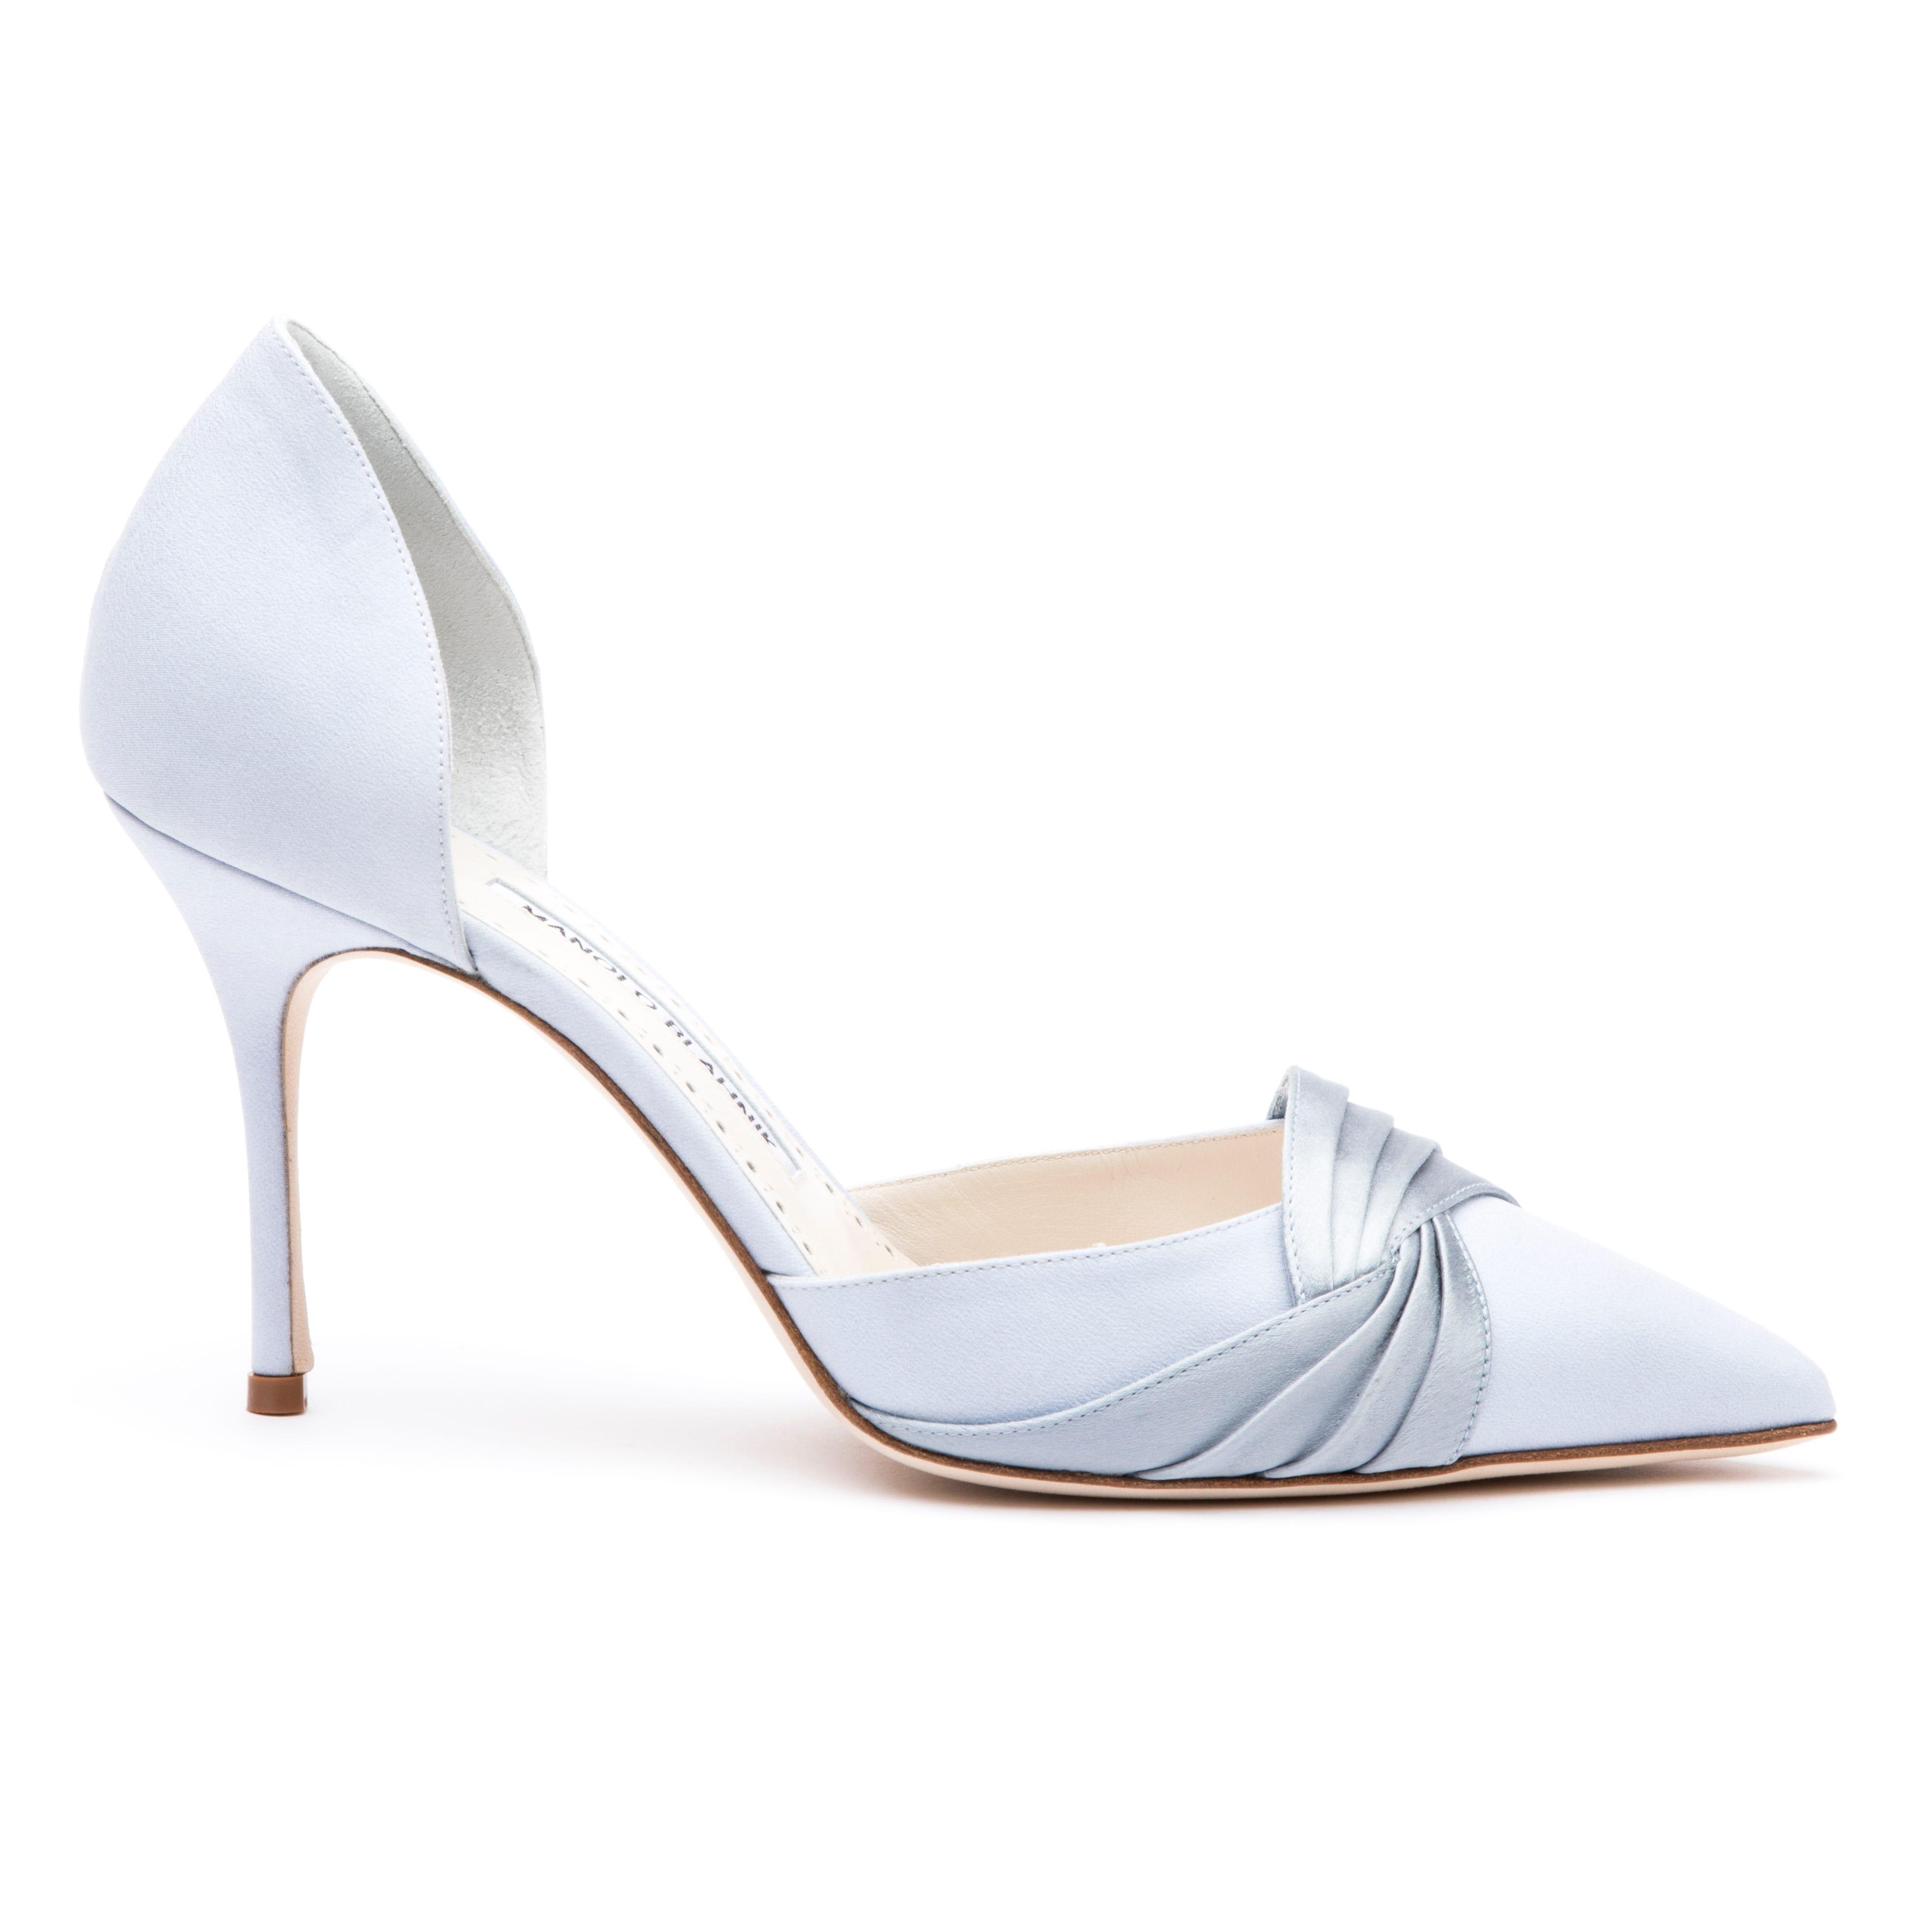 f18618a8d4e8f6 Manolo Blahnik Bridal Collection Launch Wedding Shoes